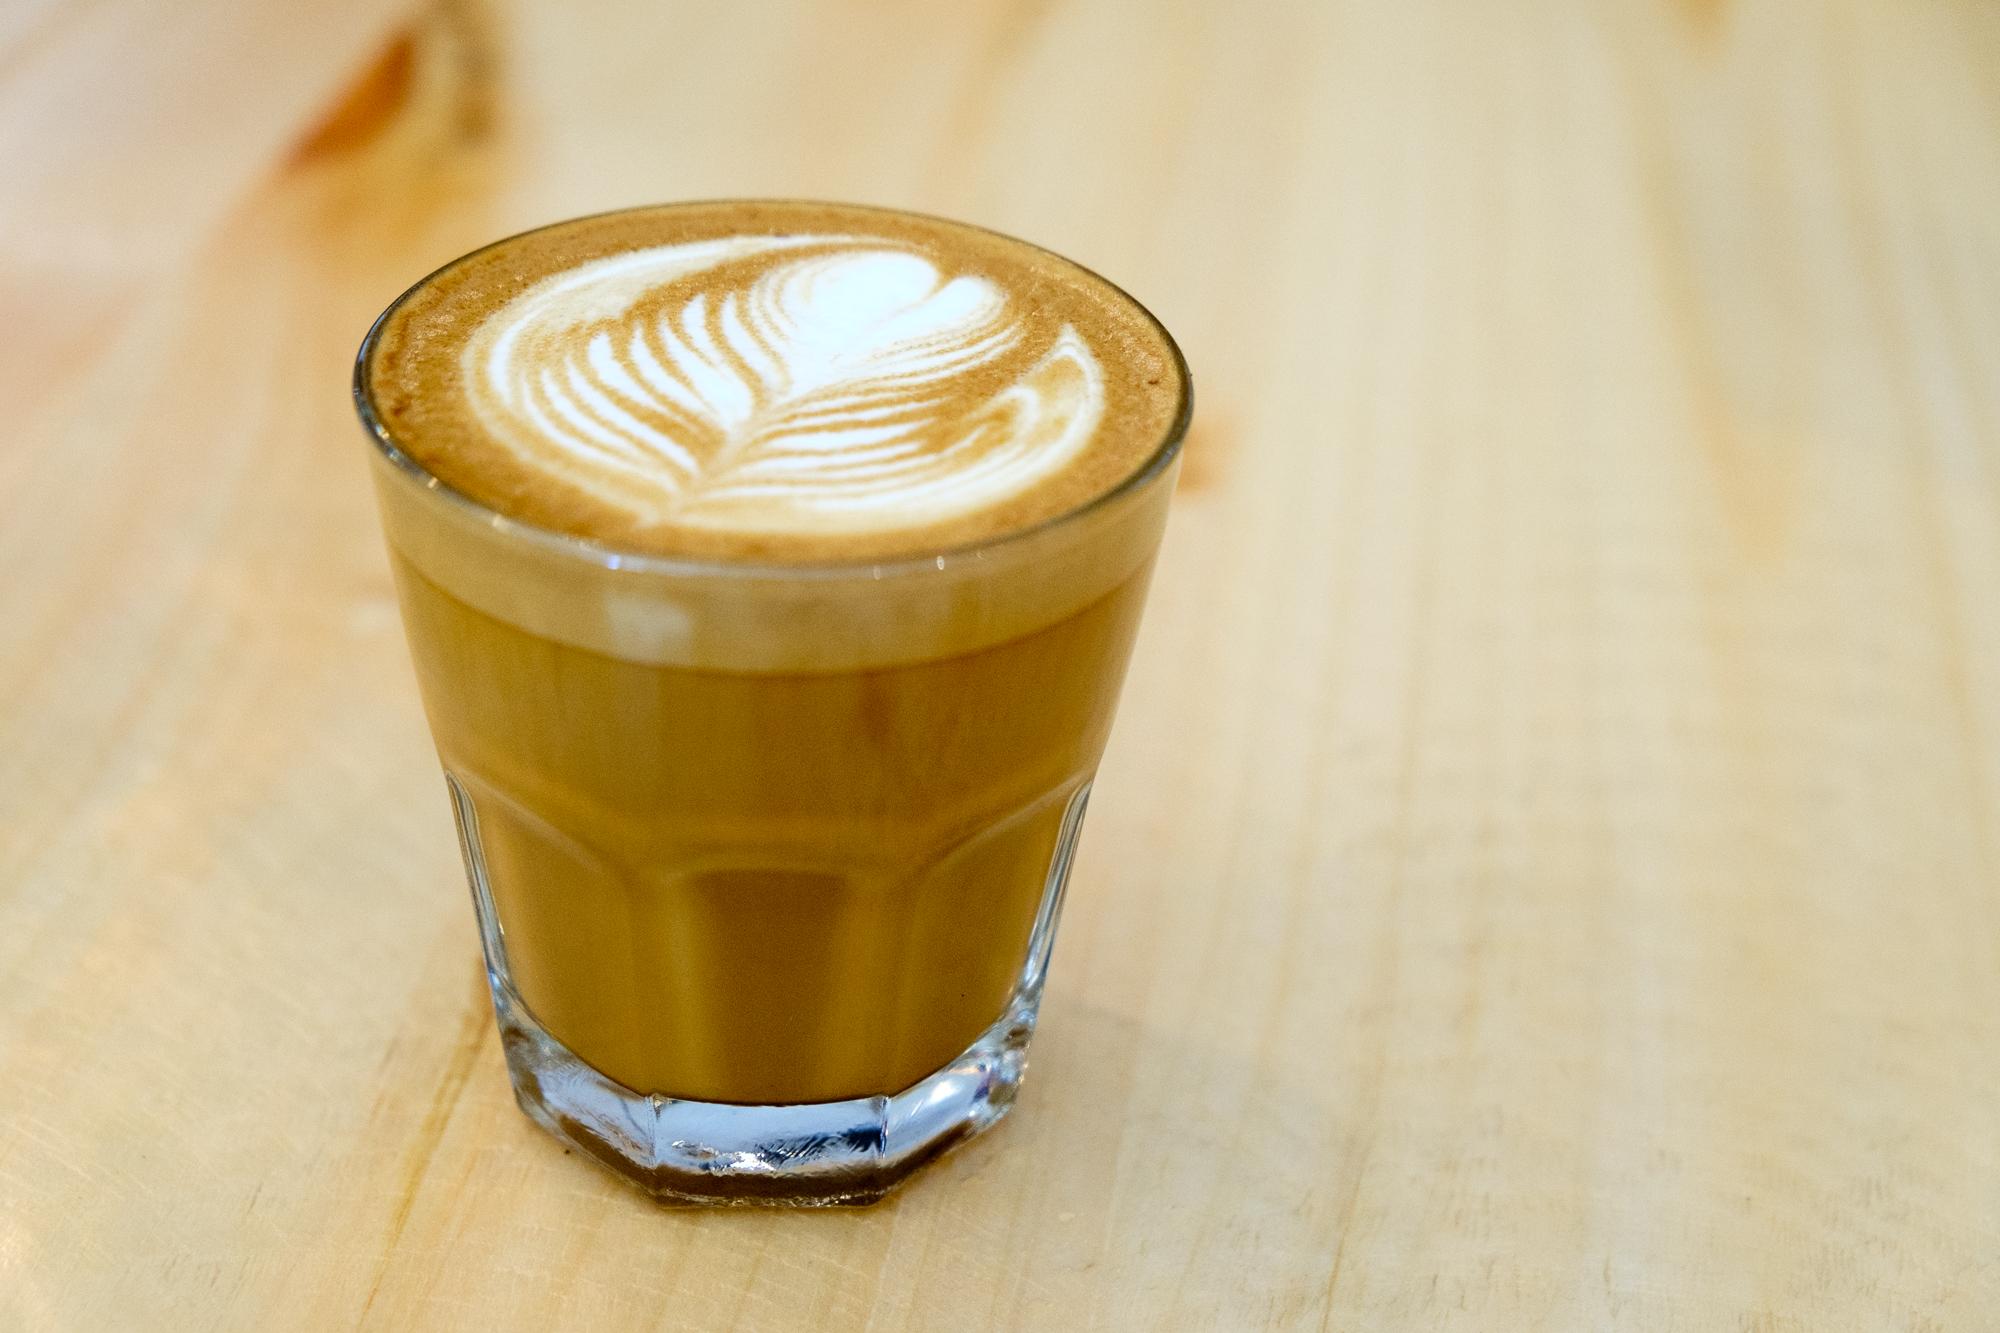 Picture of a Cortado coffee